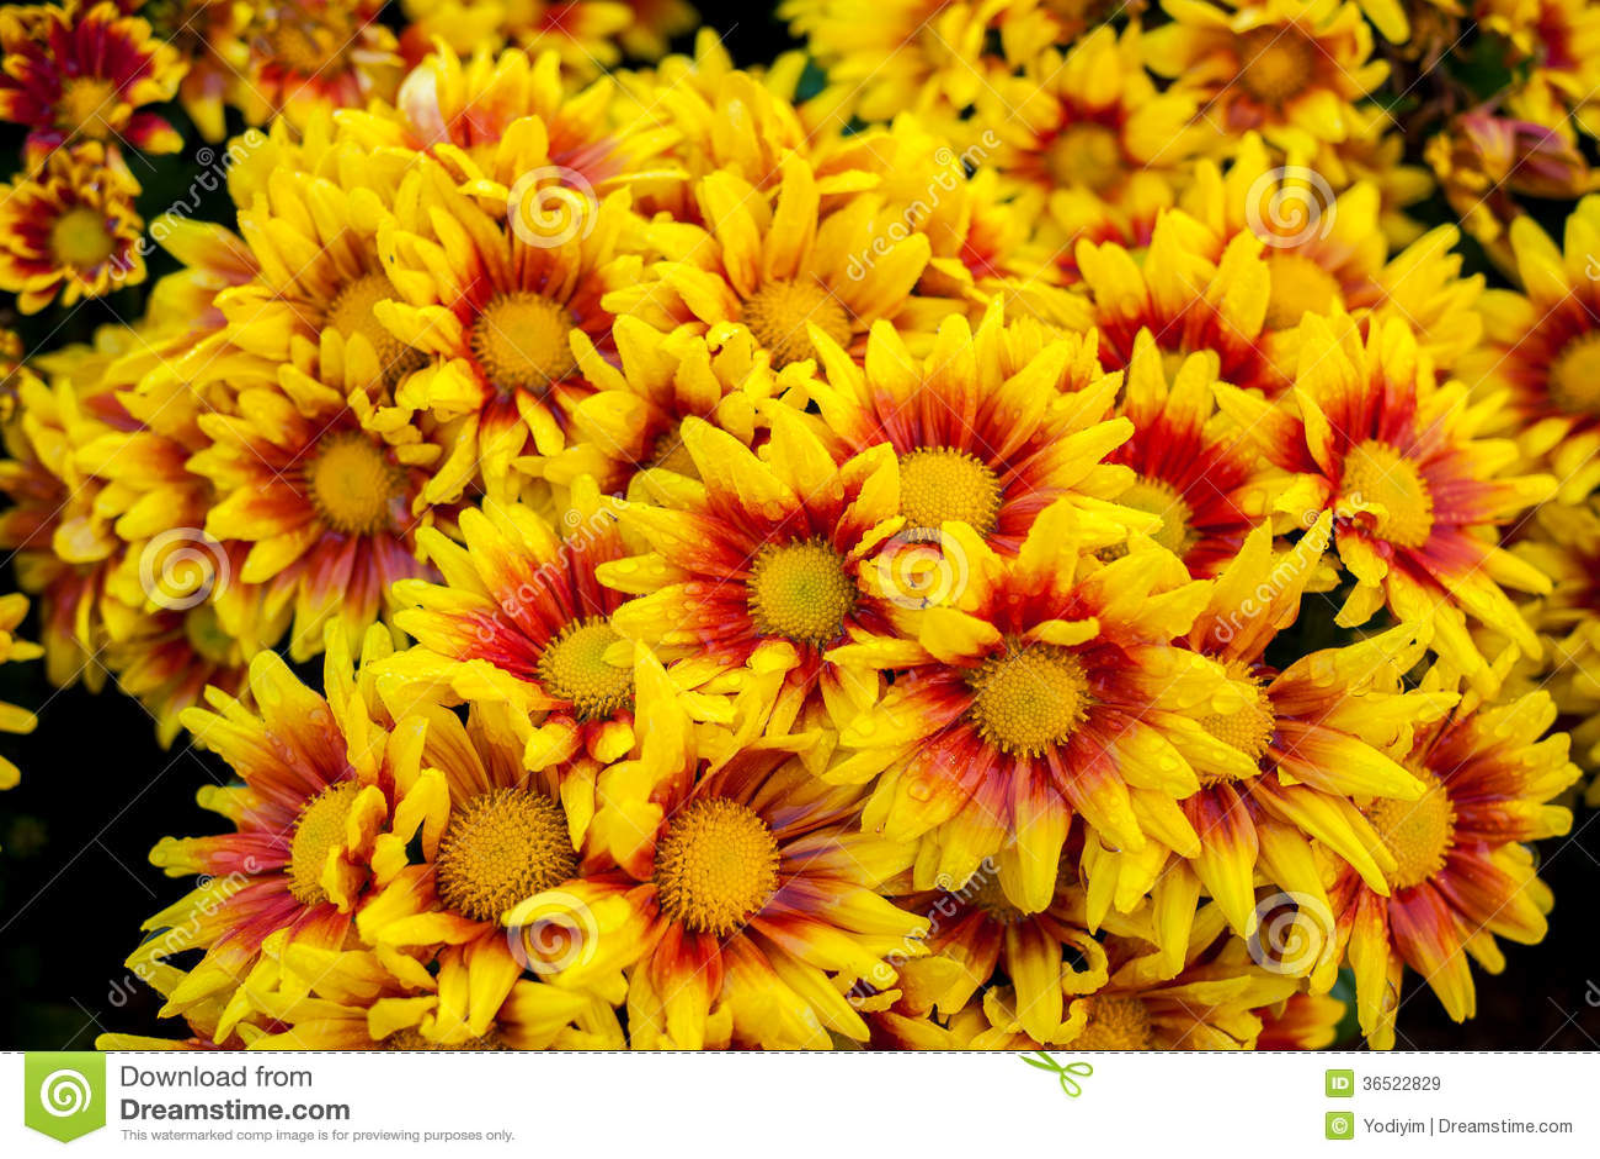 Chrysanthemum beautiful flowers